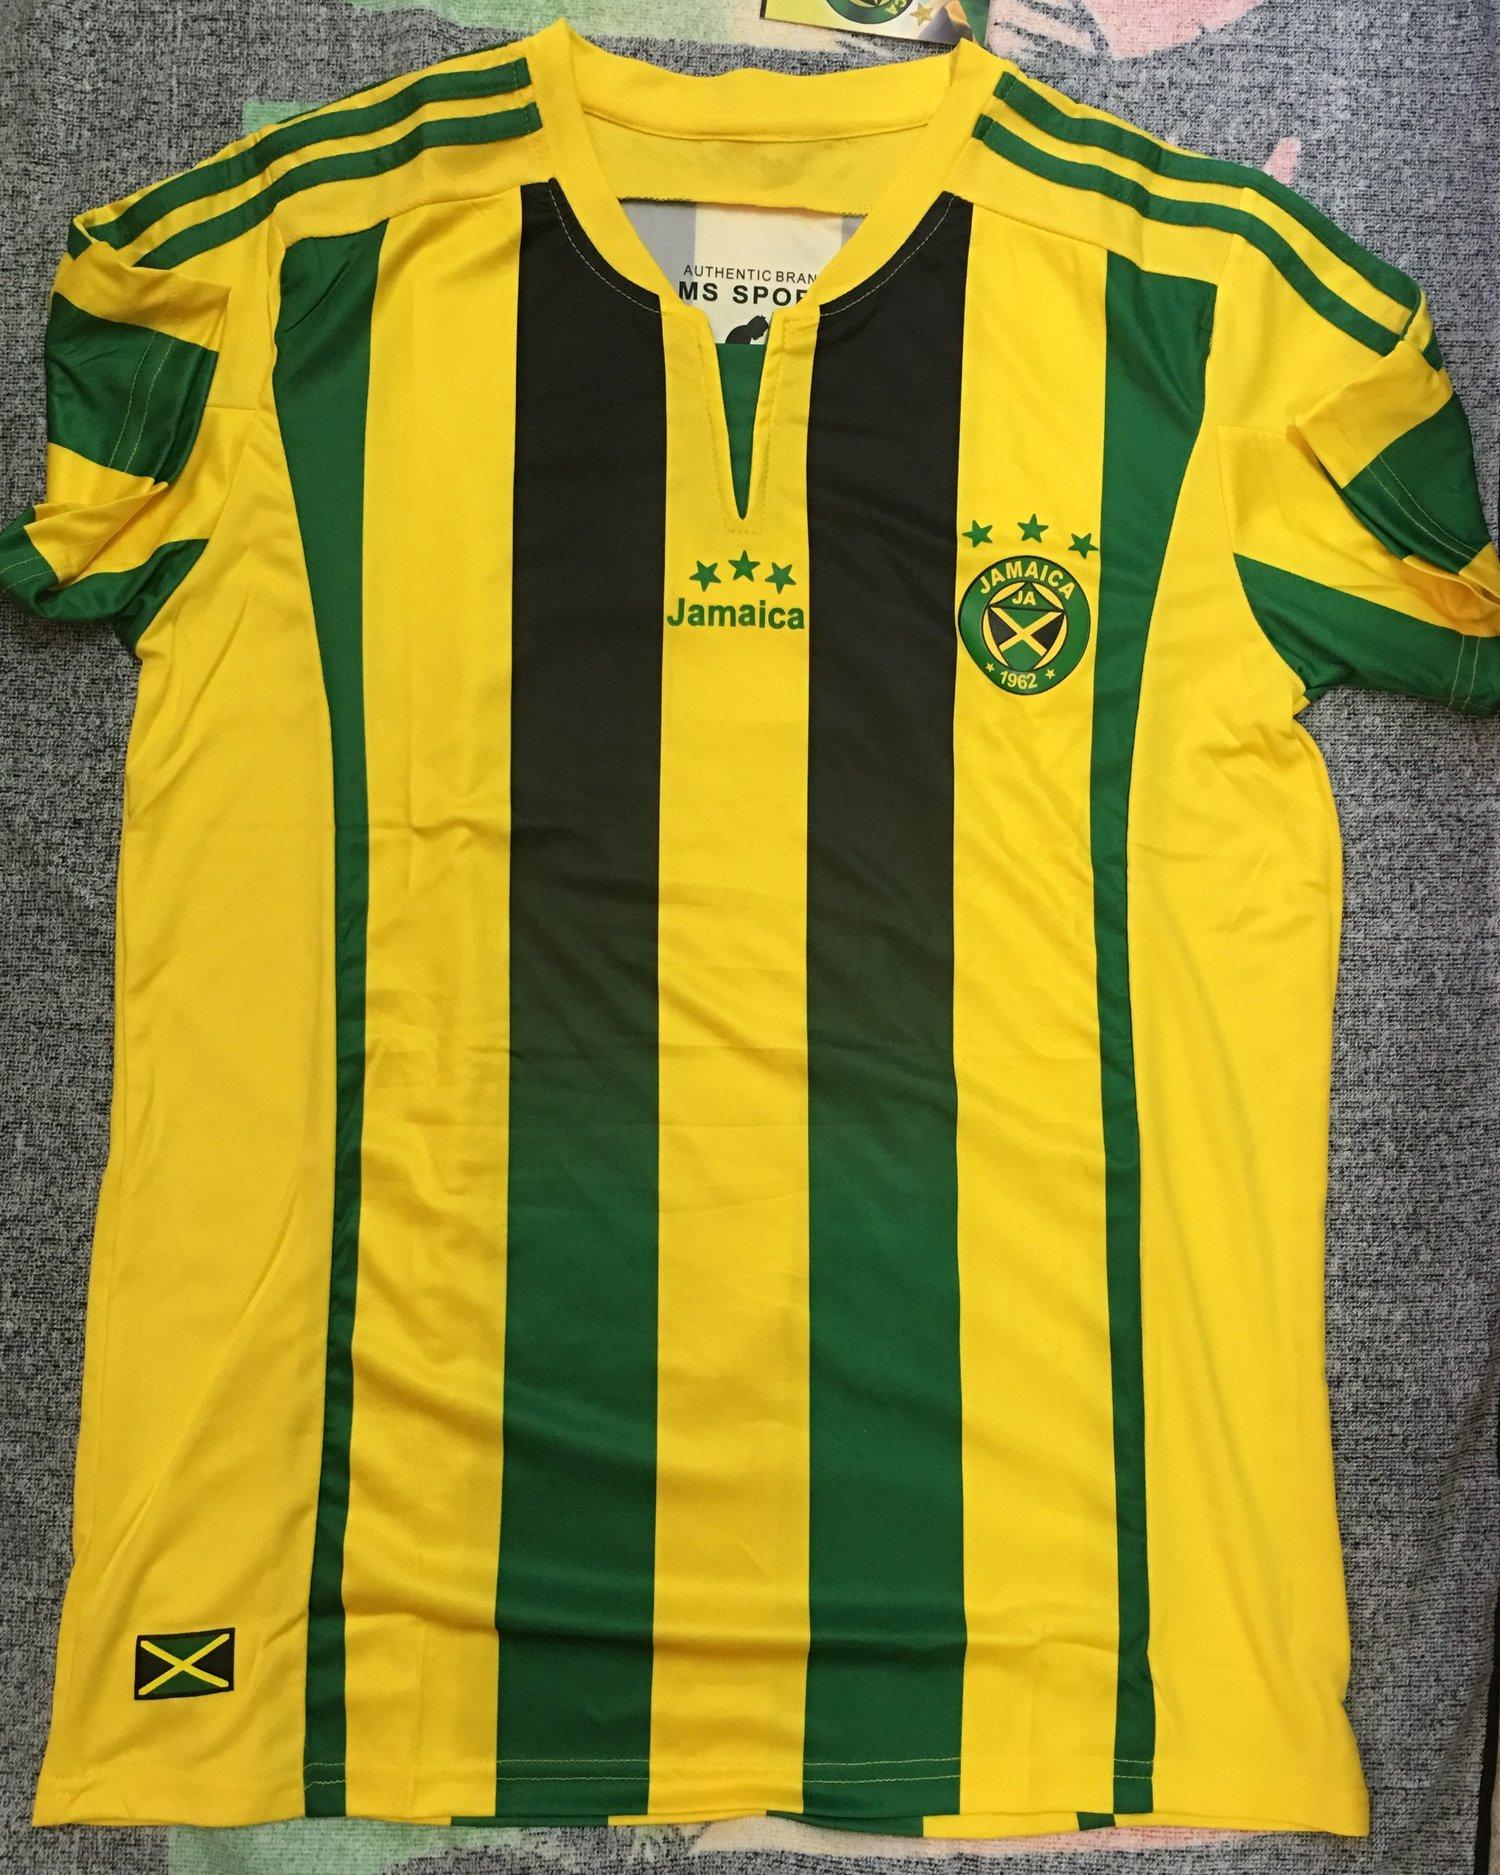 a72b4cb0c34 Image of Yellow Jamaica Football Jersey